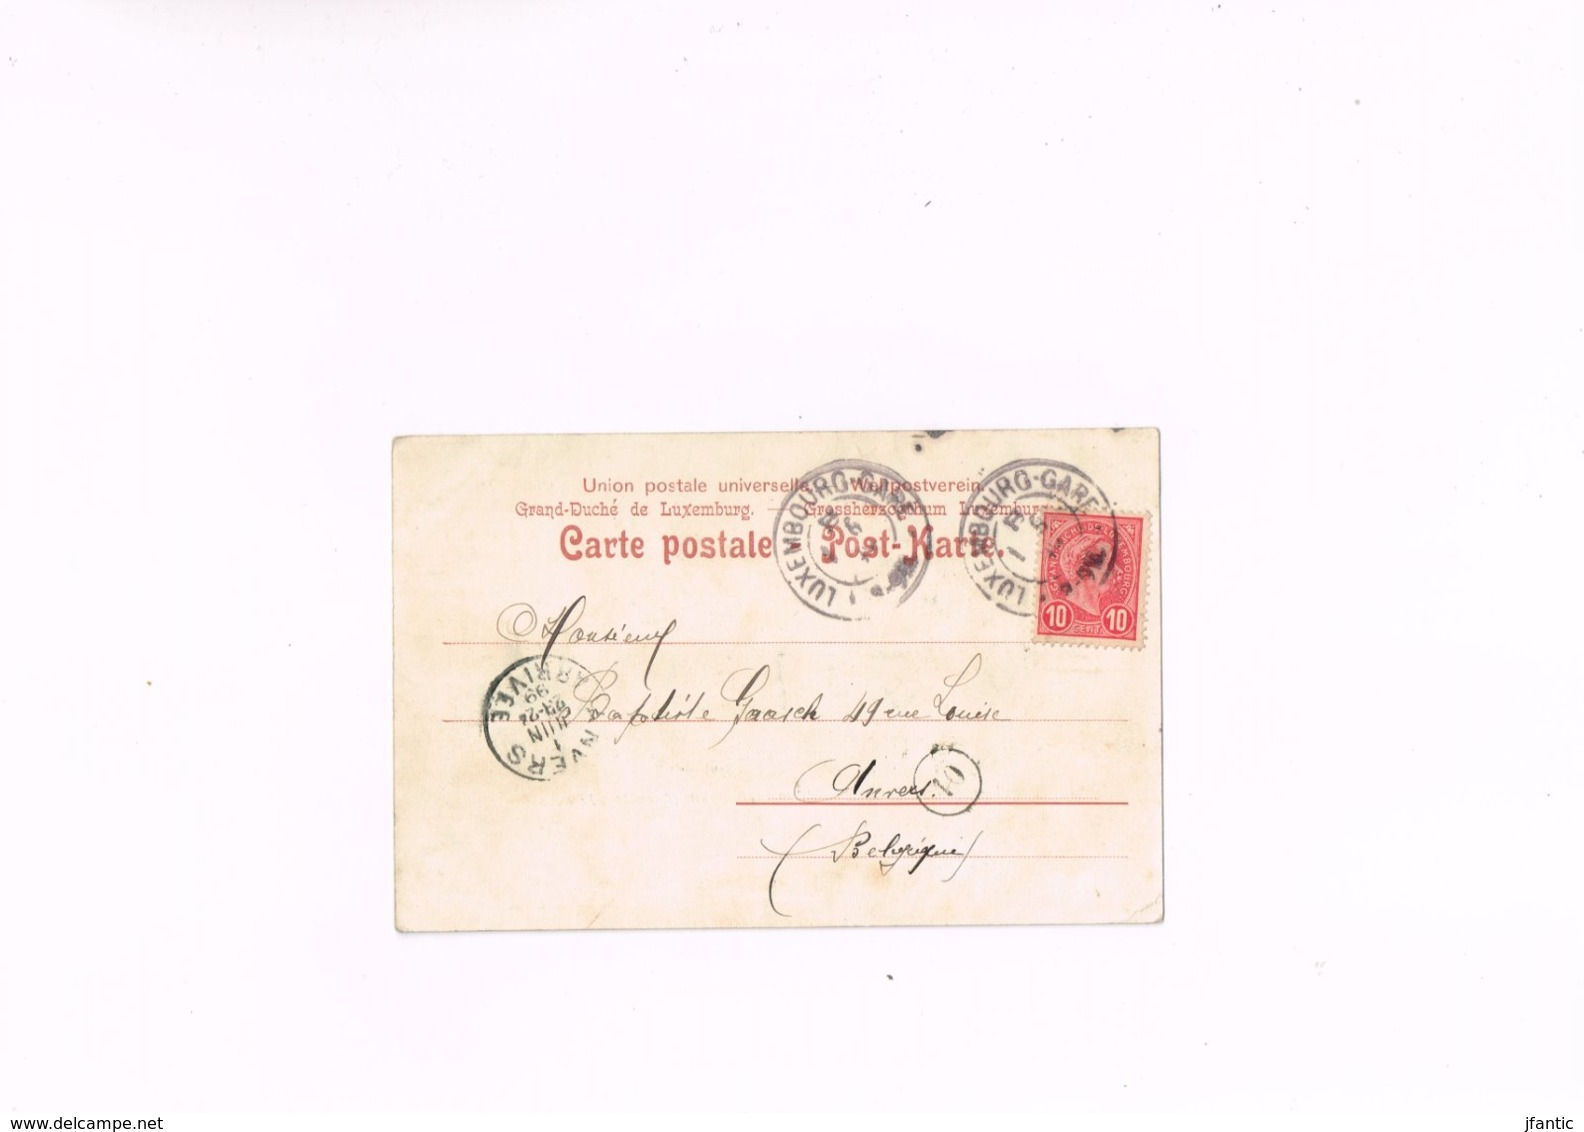 Gruss Aus Wormeldingen Luxemburg W Albrecht Forbach I.lothr, Carte Postale Ancienne 1899. - Autres